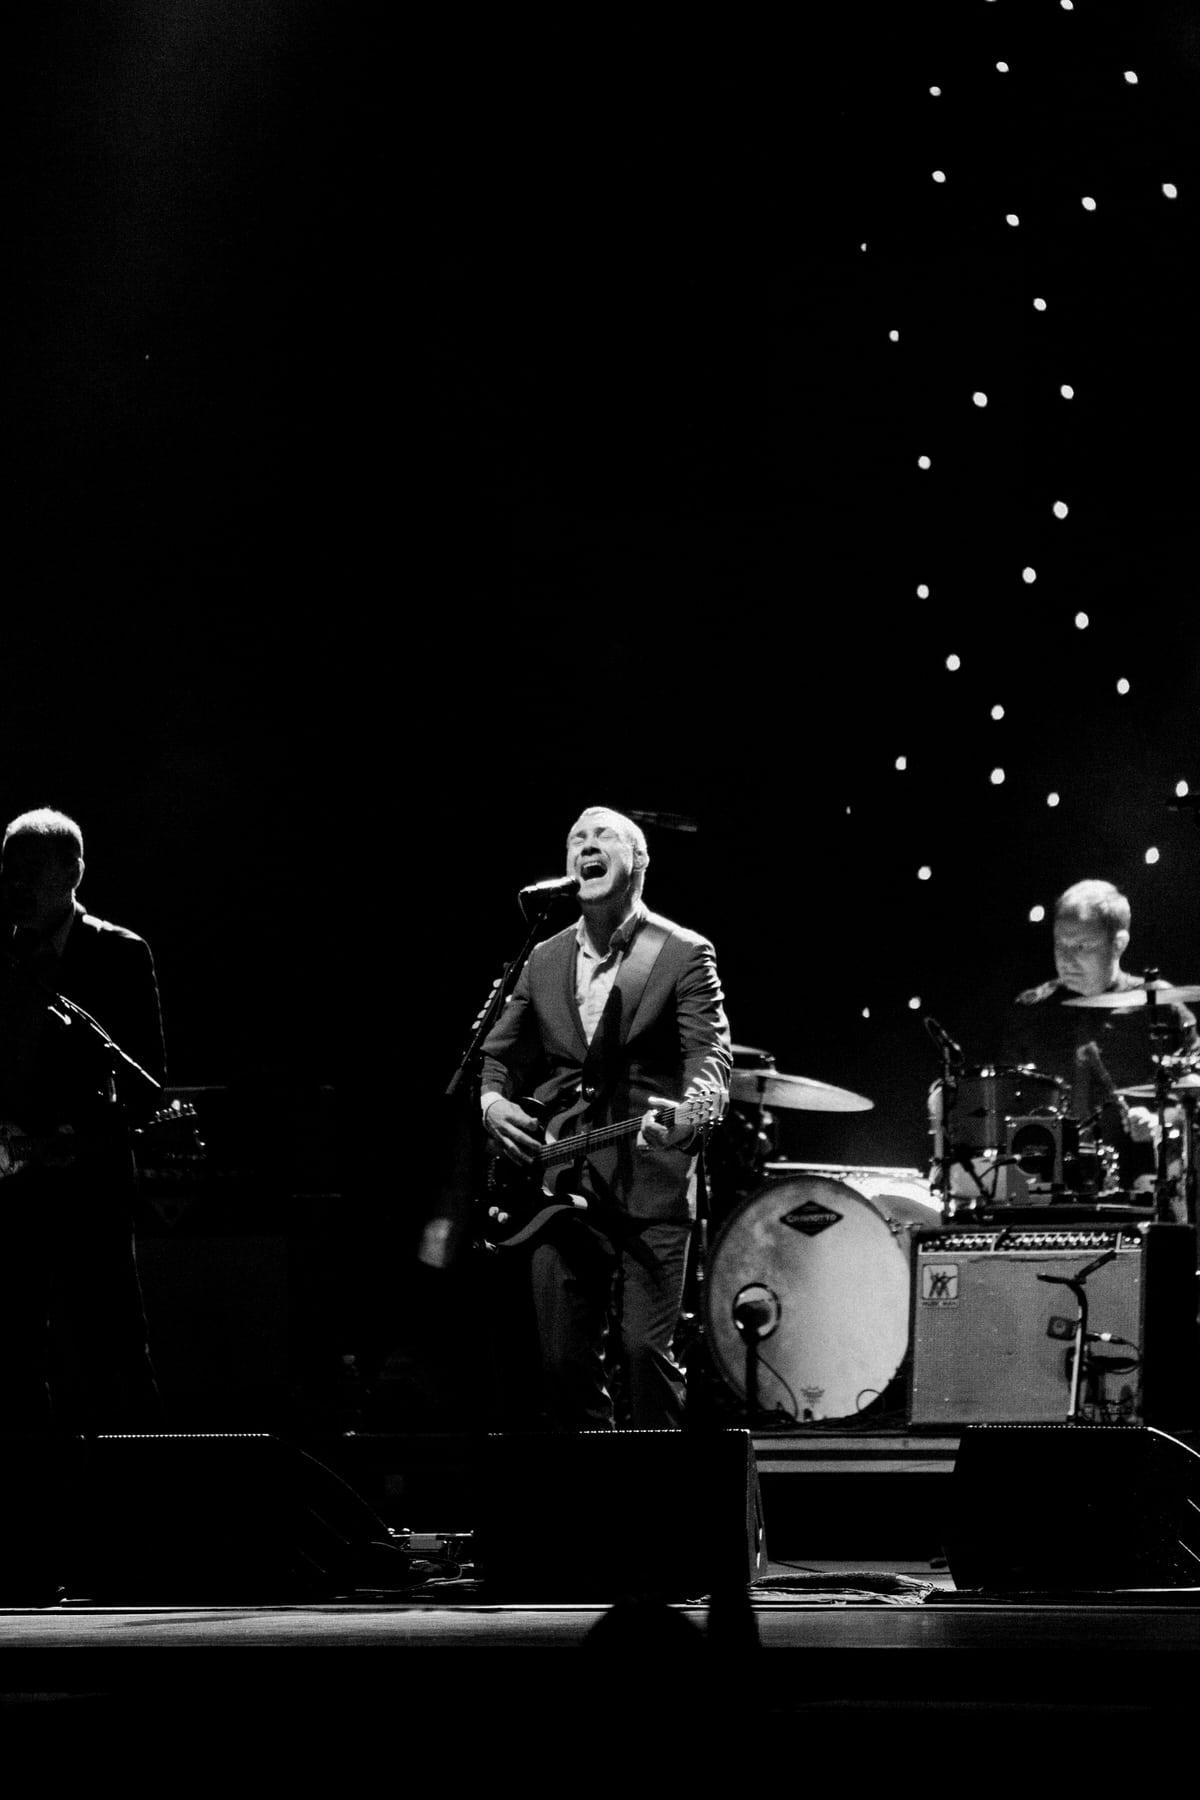 David-Gray-Ray-LaMontagne-concert-Jay-Pritzker-Paviilion-Chicago-Illinois-black-and-white-fine-art-photography-by-Studio-L-photographer-Laura-Schneider-_3643